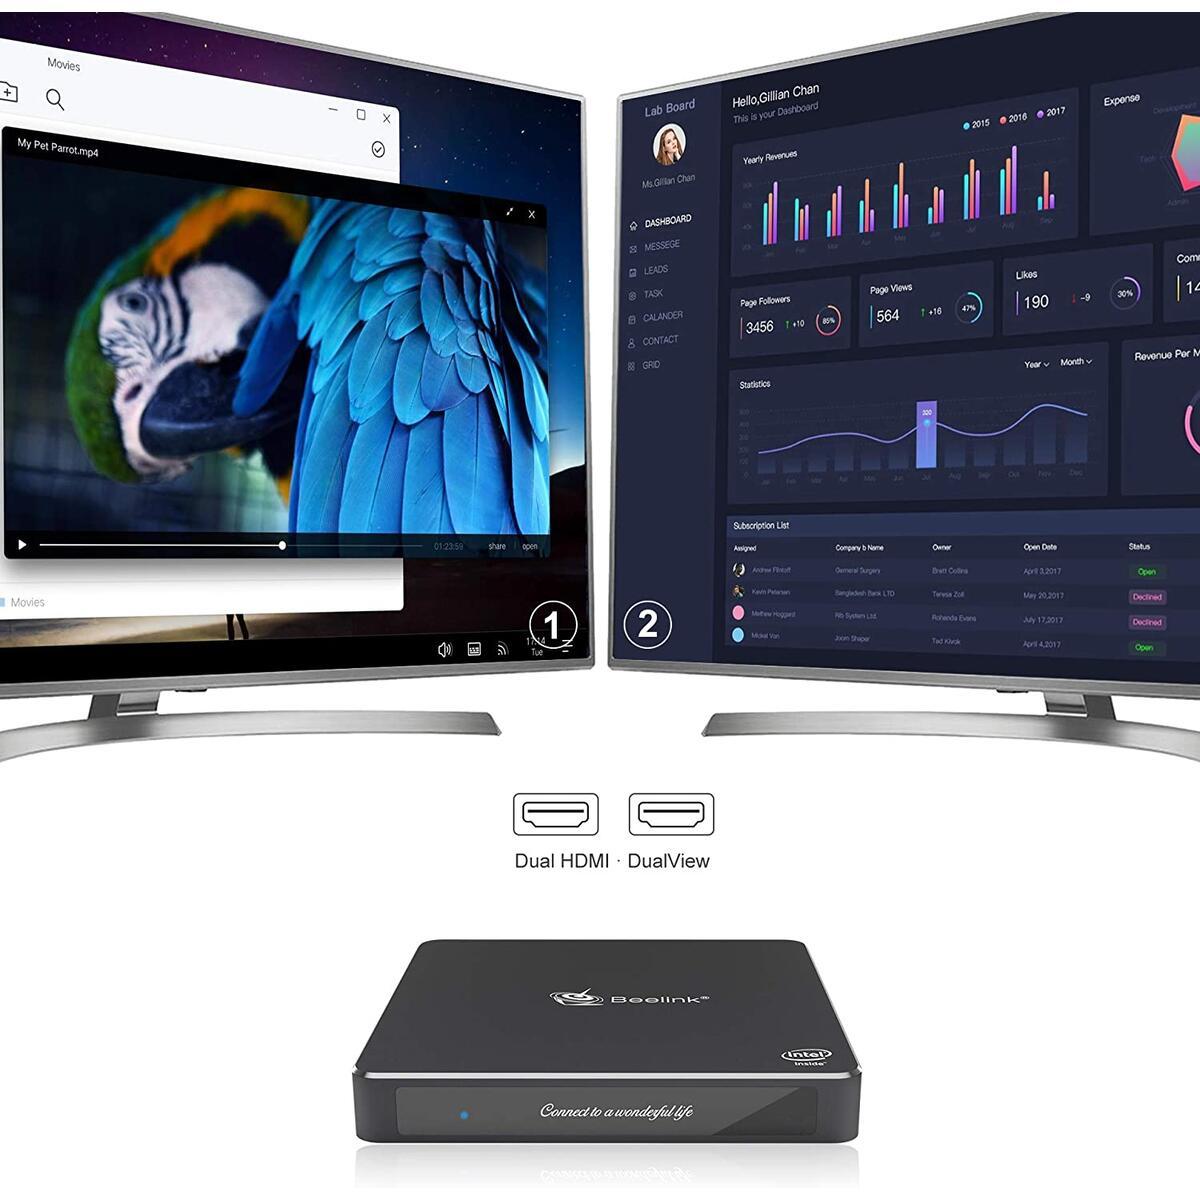 Beelink Mini PC Intel Celeron N3450(up to 2.2GHz),Windows 10 Pro Mini Desktop Computer, 8GB DDR3/128GB SSD, 2.4G/5G Dual WiFi, Gigabit Ethernet, 4K HD Dual HDMI Ports, BT4.0